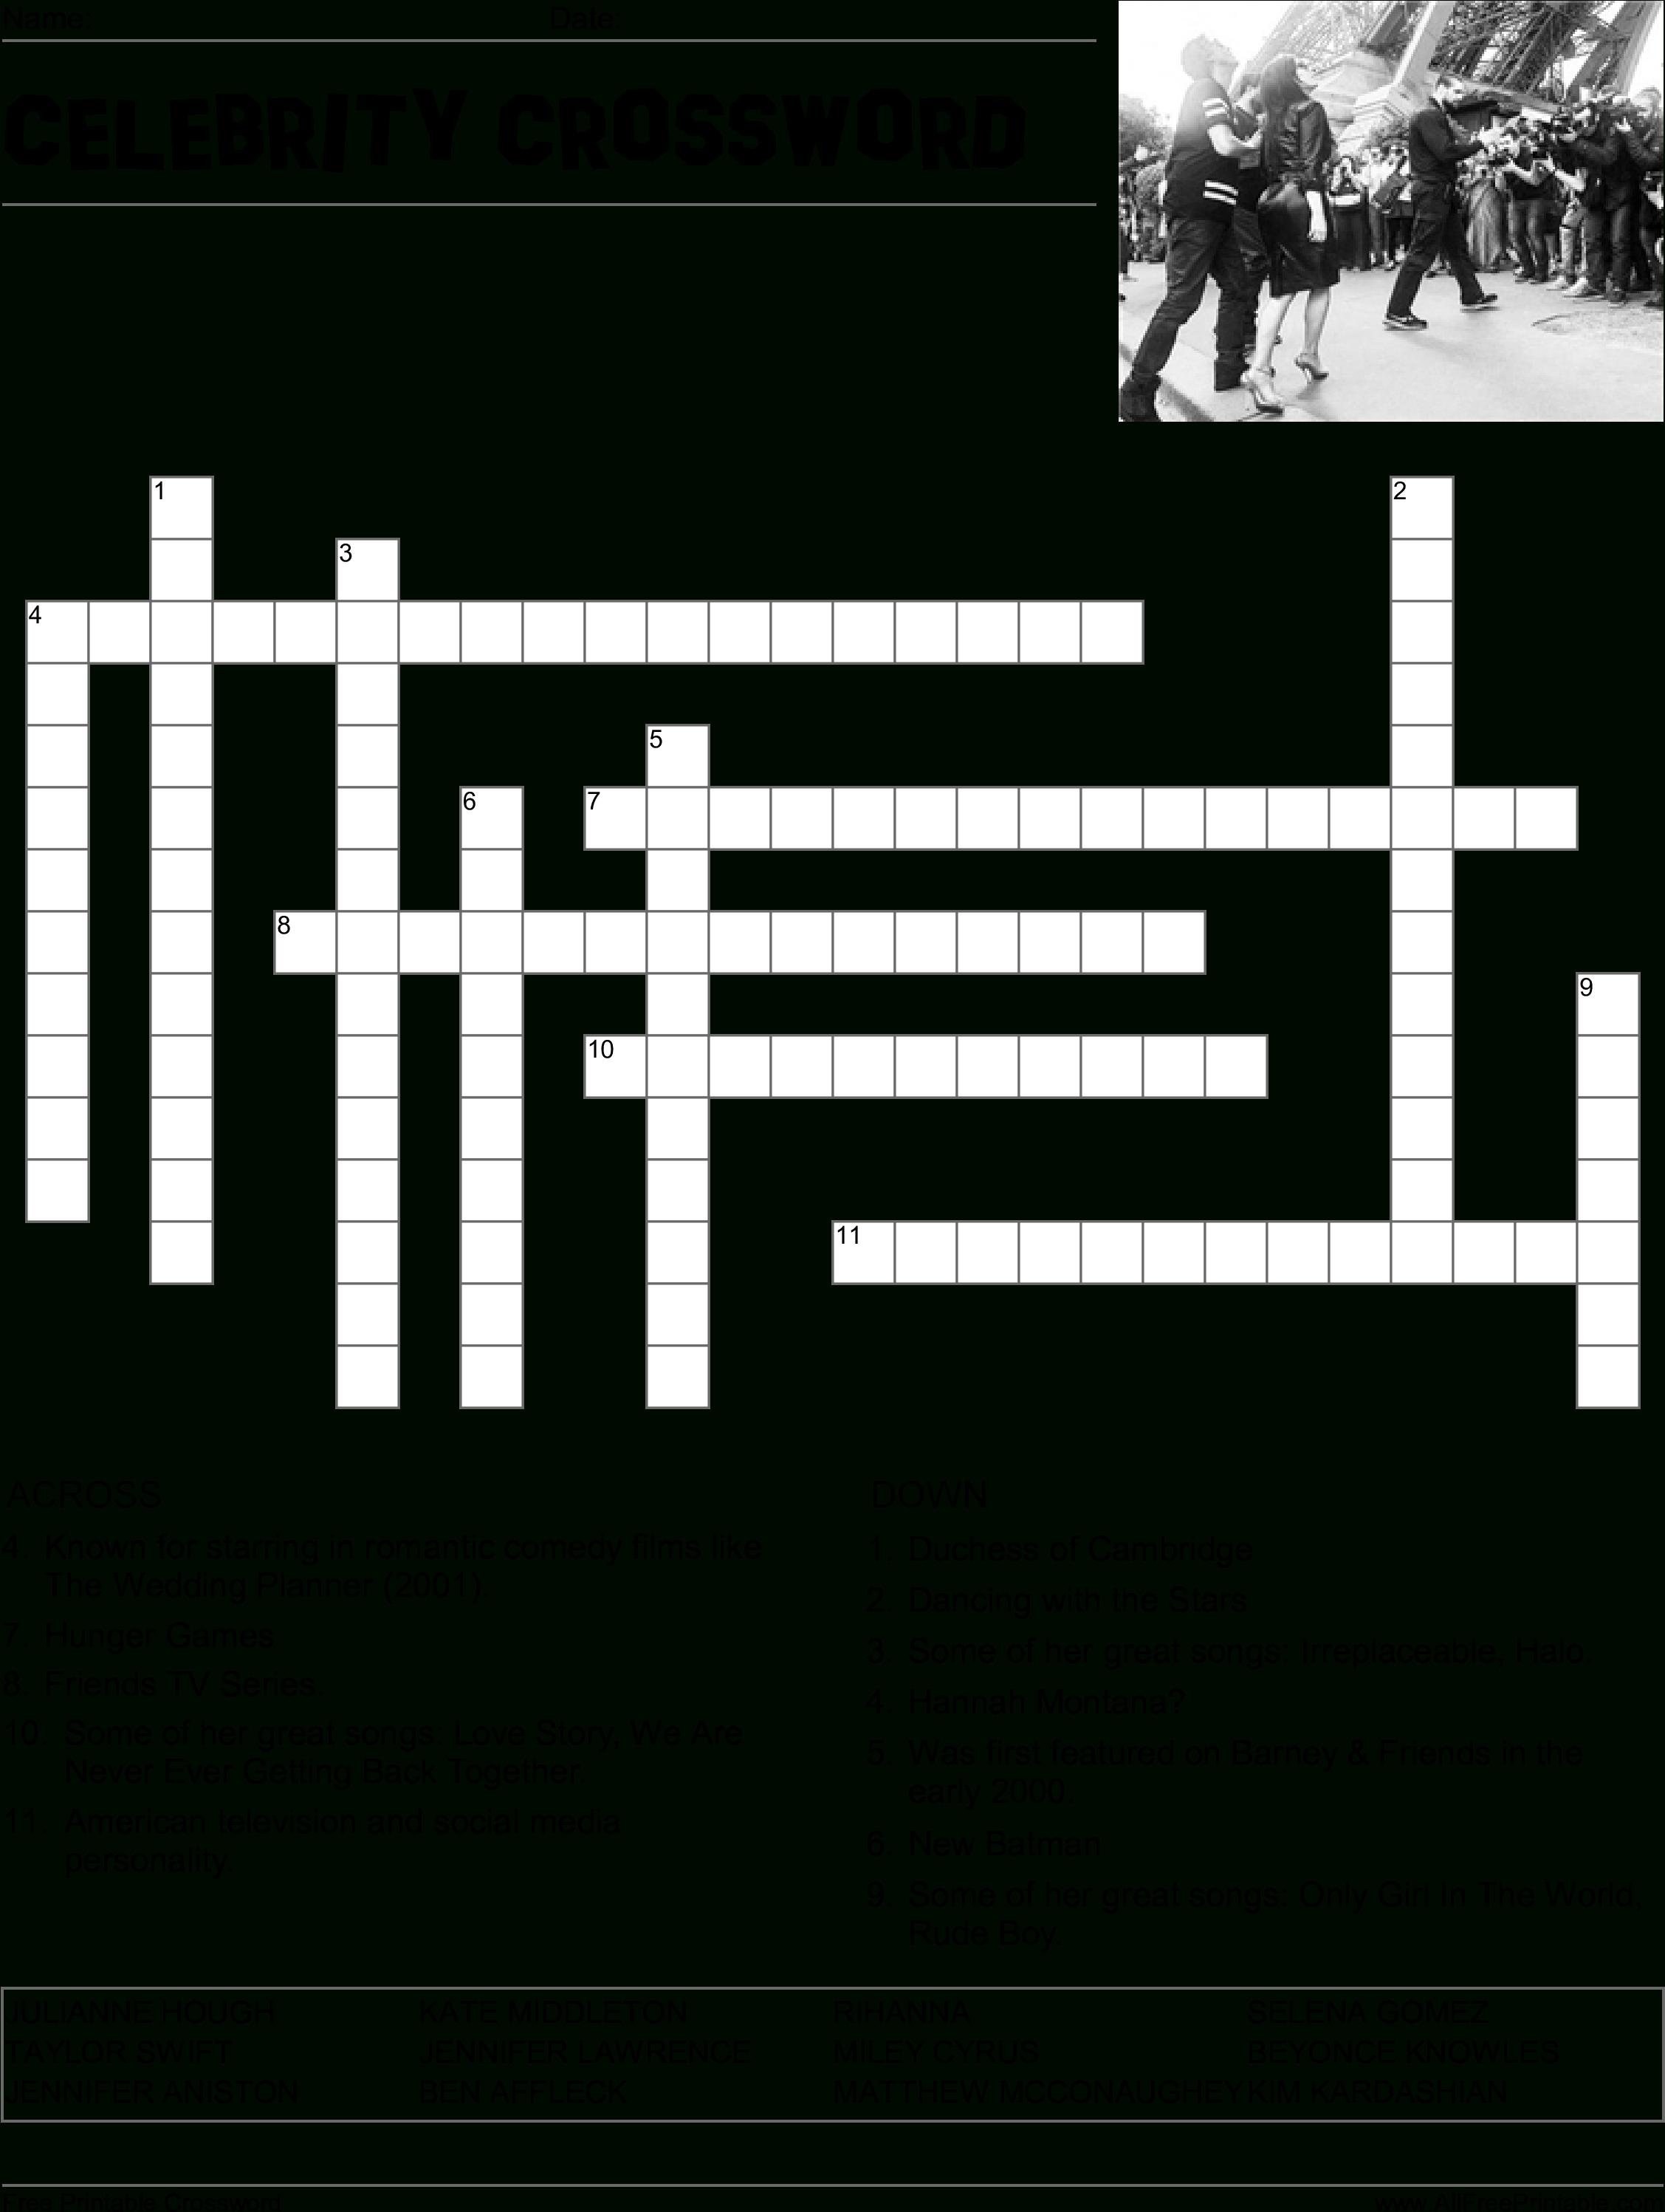 Hd Celebrity Crossword Puzzle Main Image Download Template - Word - Printable Crossword Puzzles Celebrities